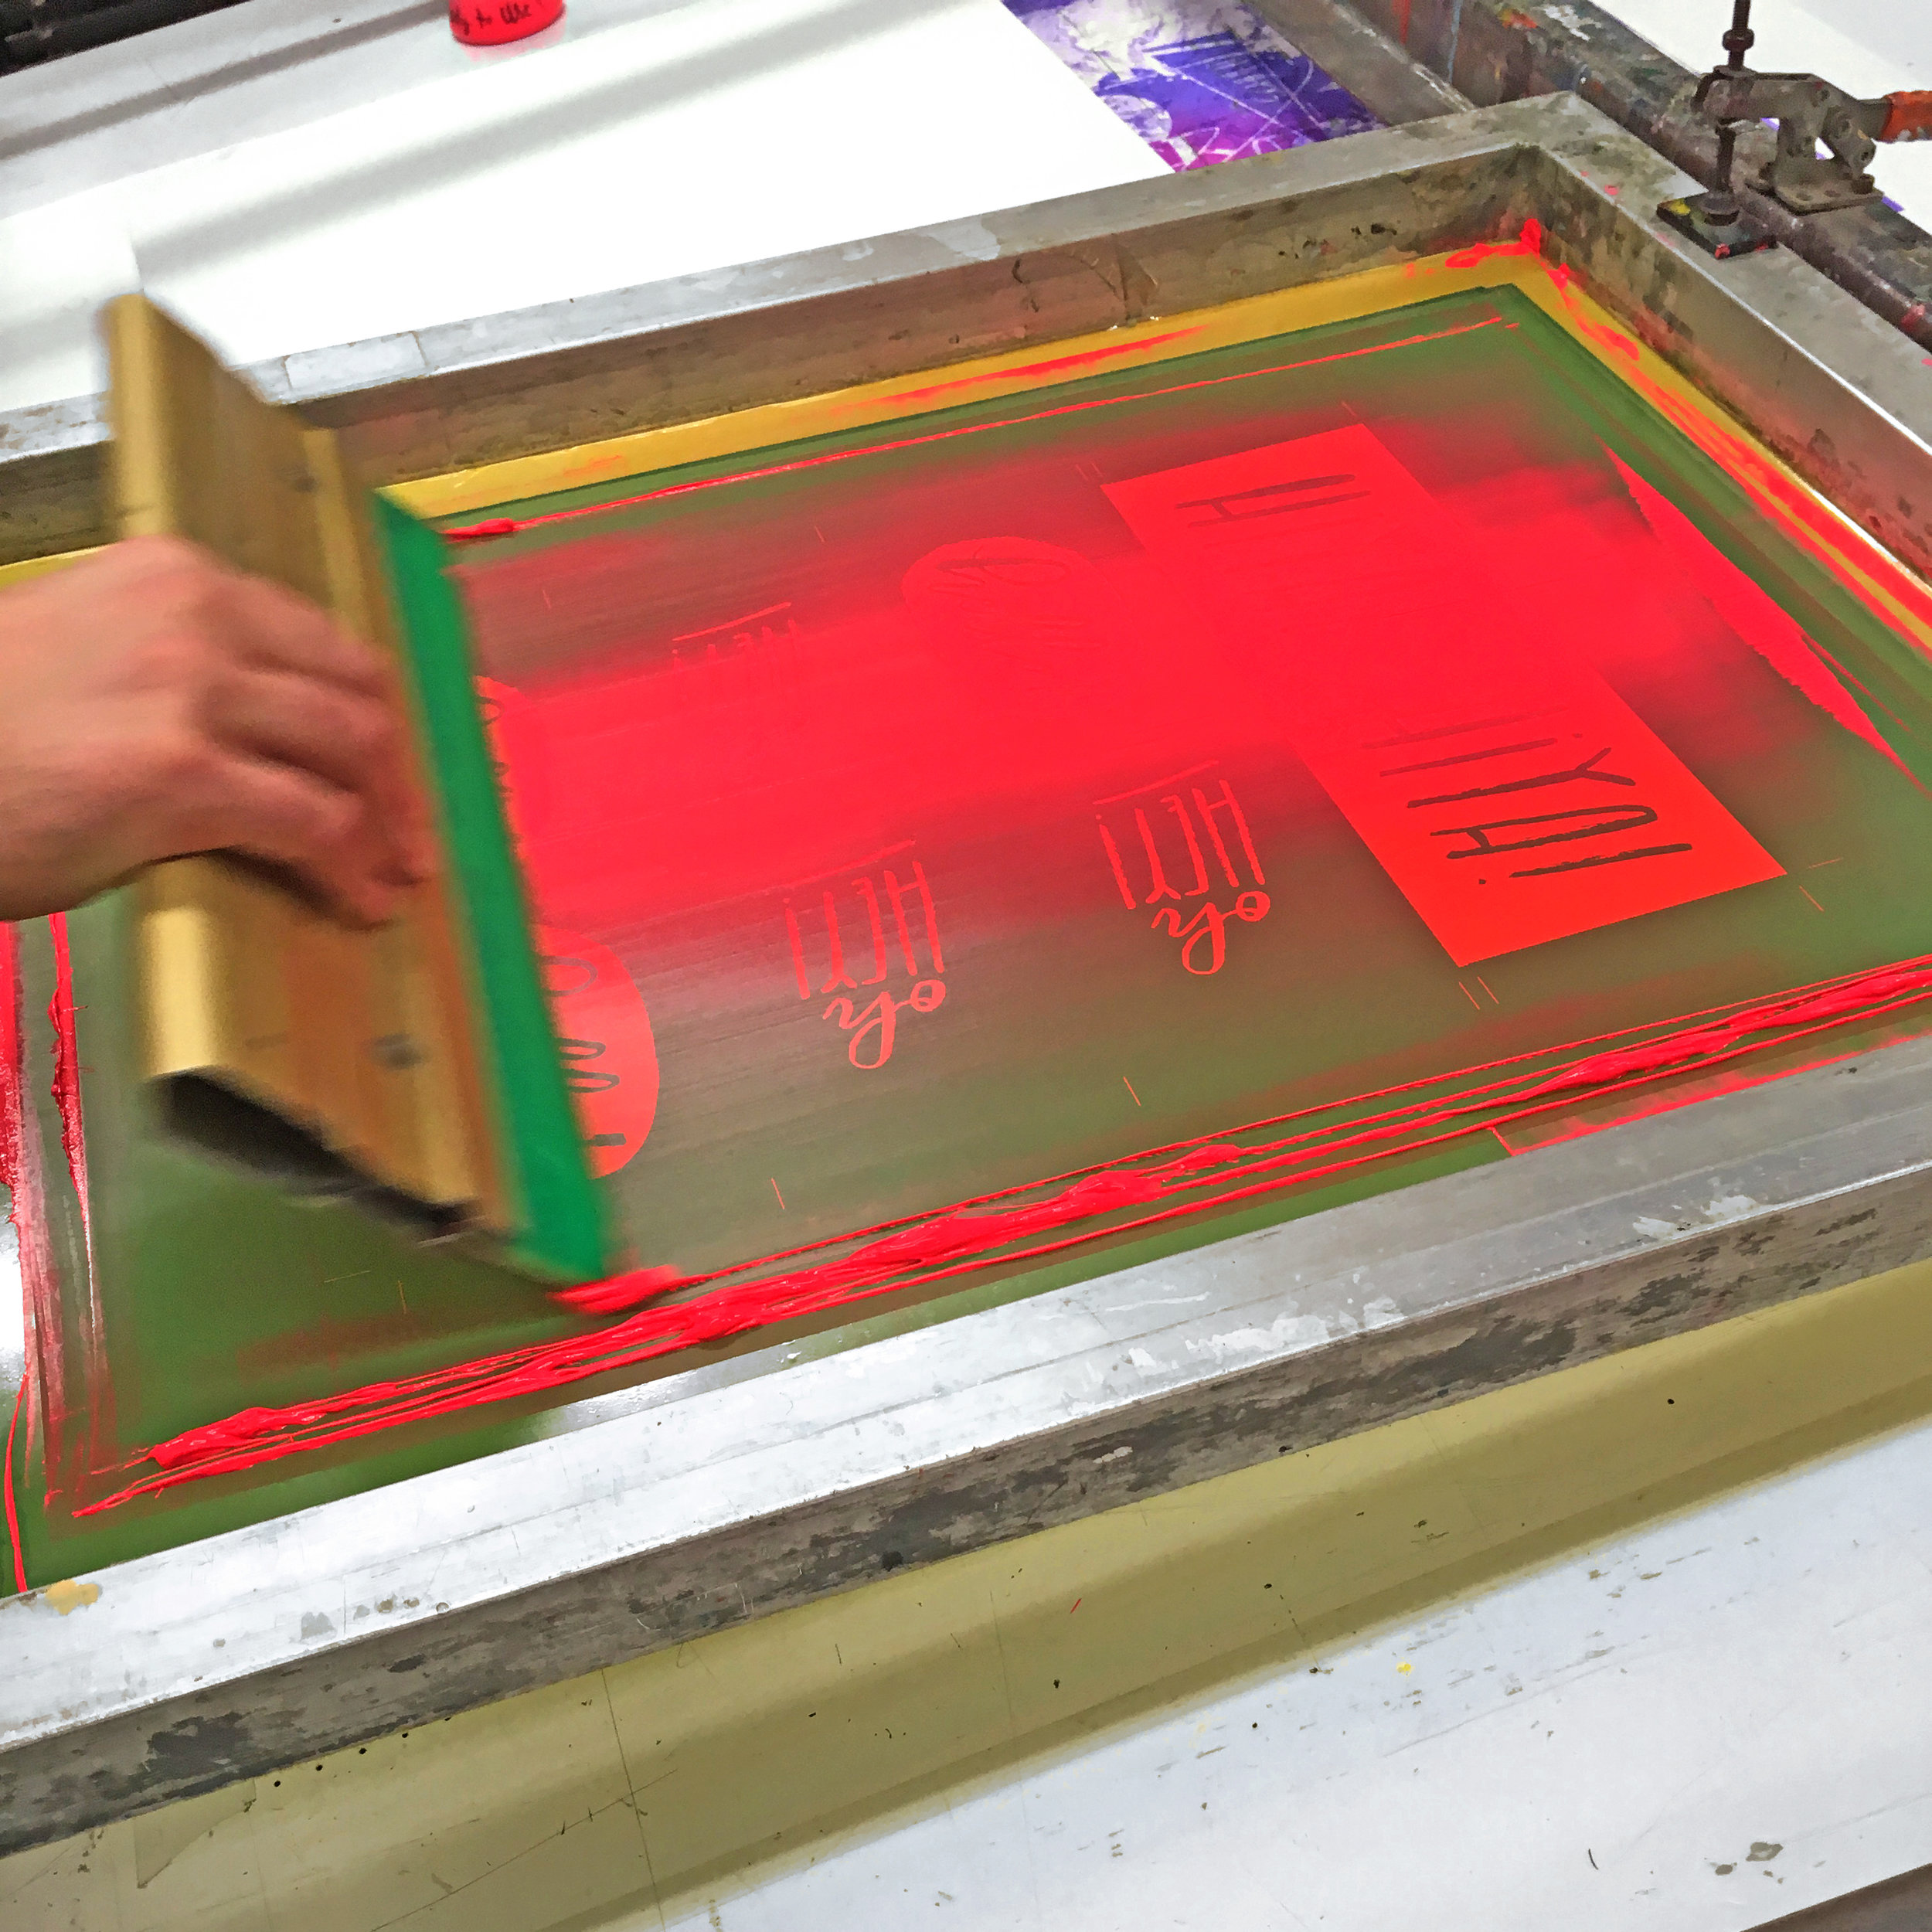 screen-printing neon ink by hand.jpg